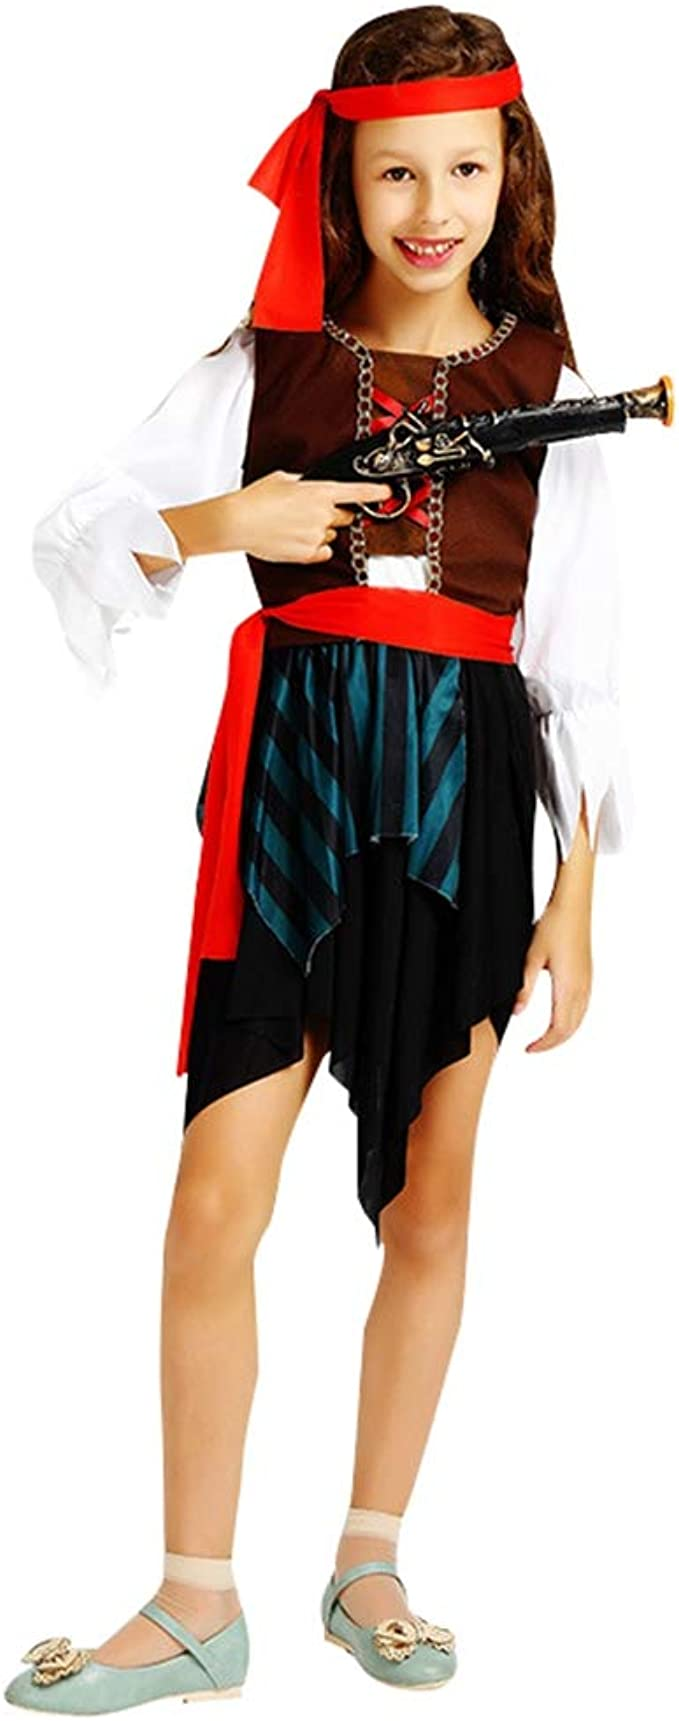 Jitong Disfraz de Pirata para Niños - Trajes Halloween de Cosplay ...